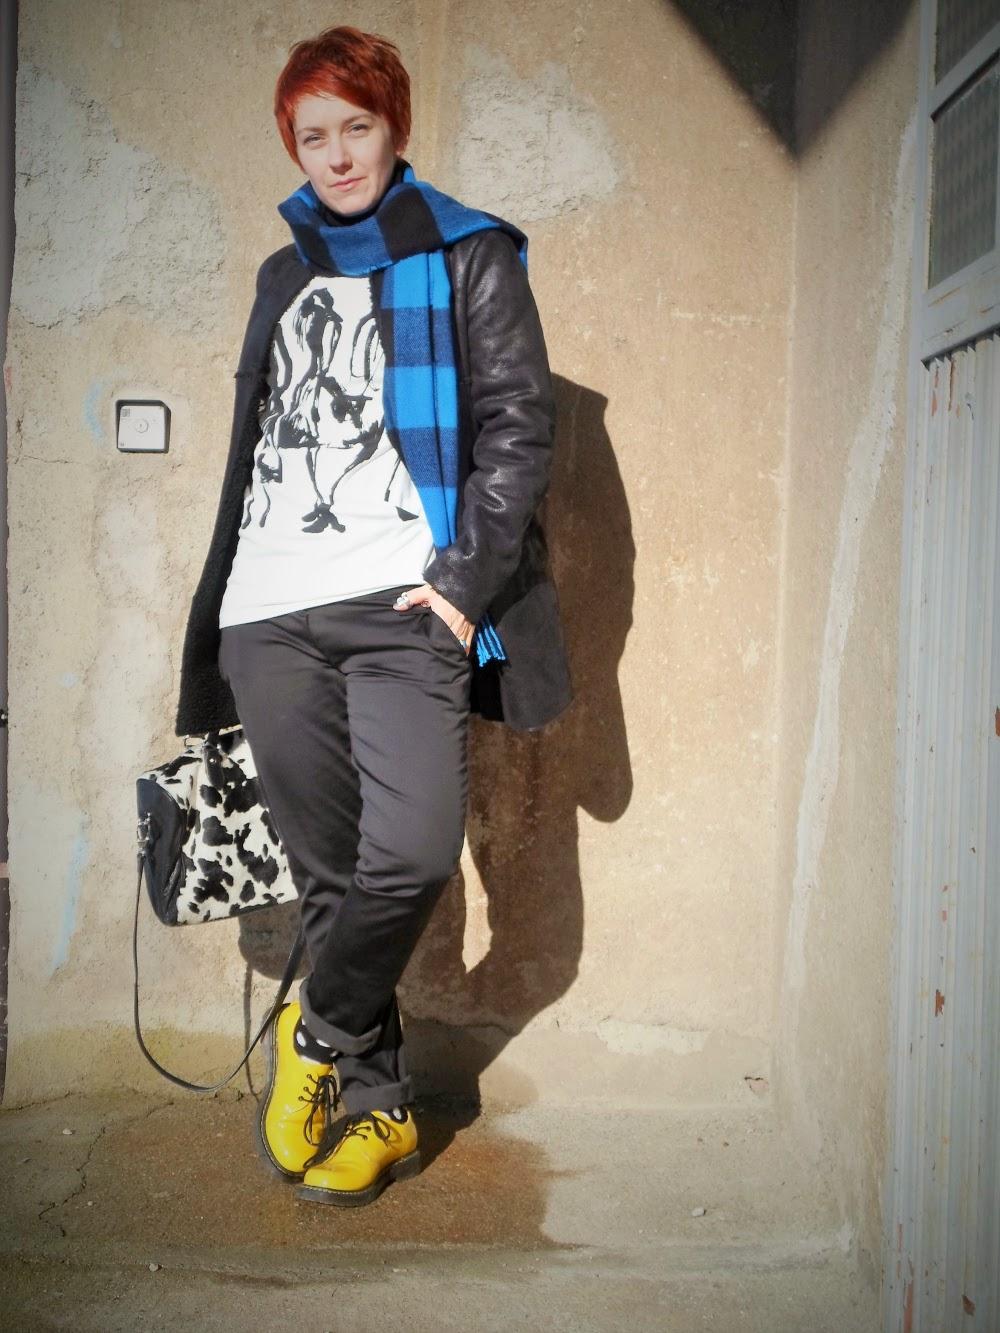 graffiti sweater plaid scarf polka dots yellow shoes fashion style blog